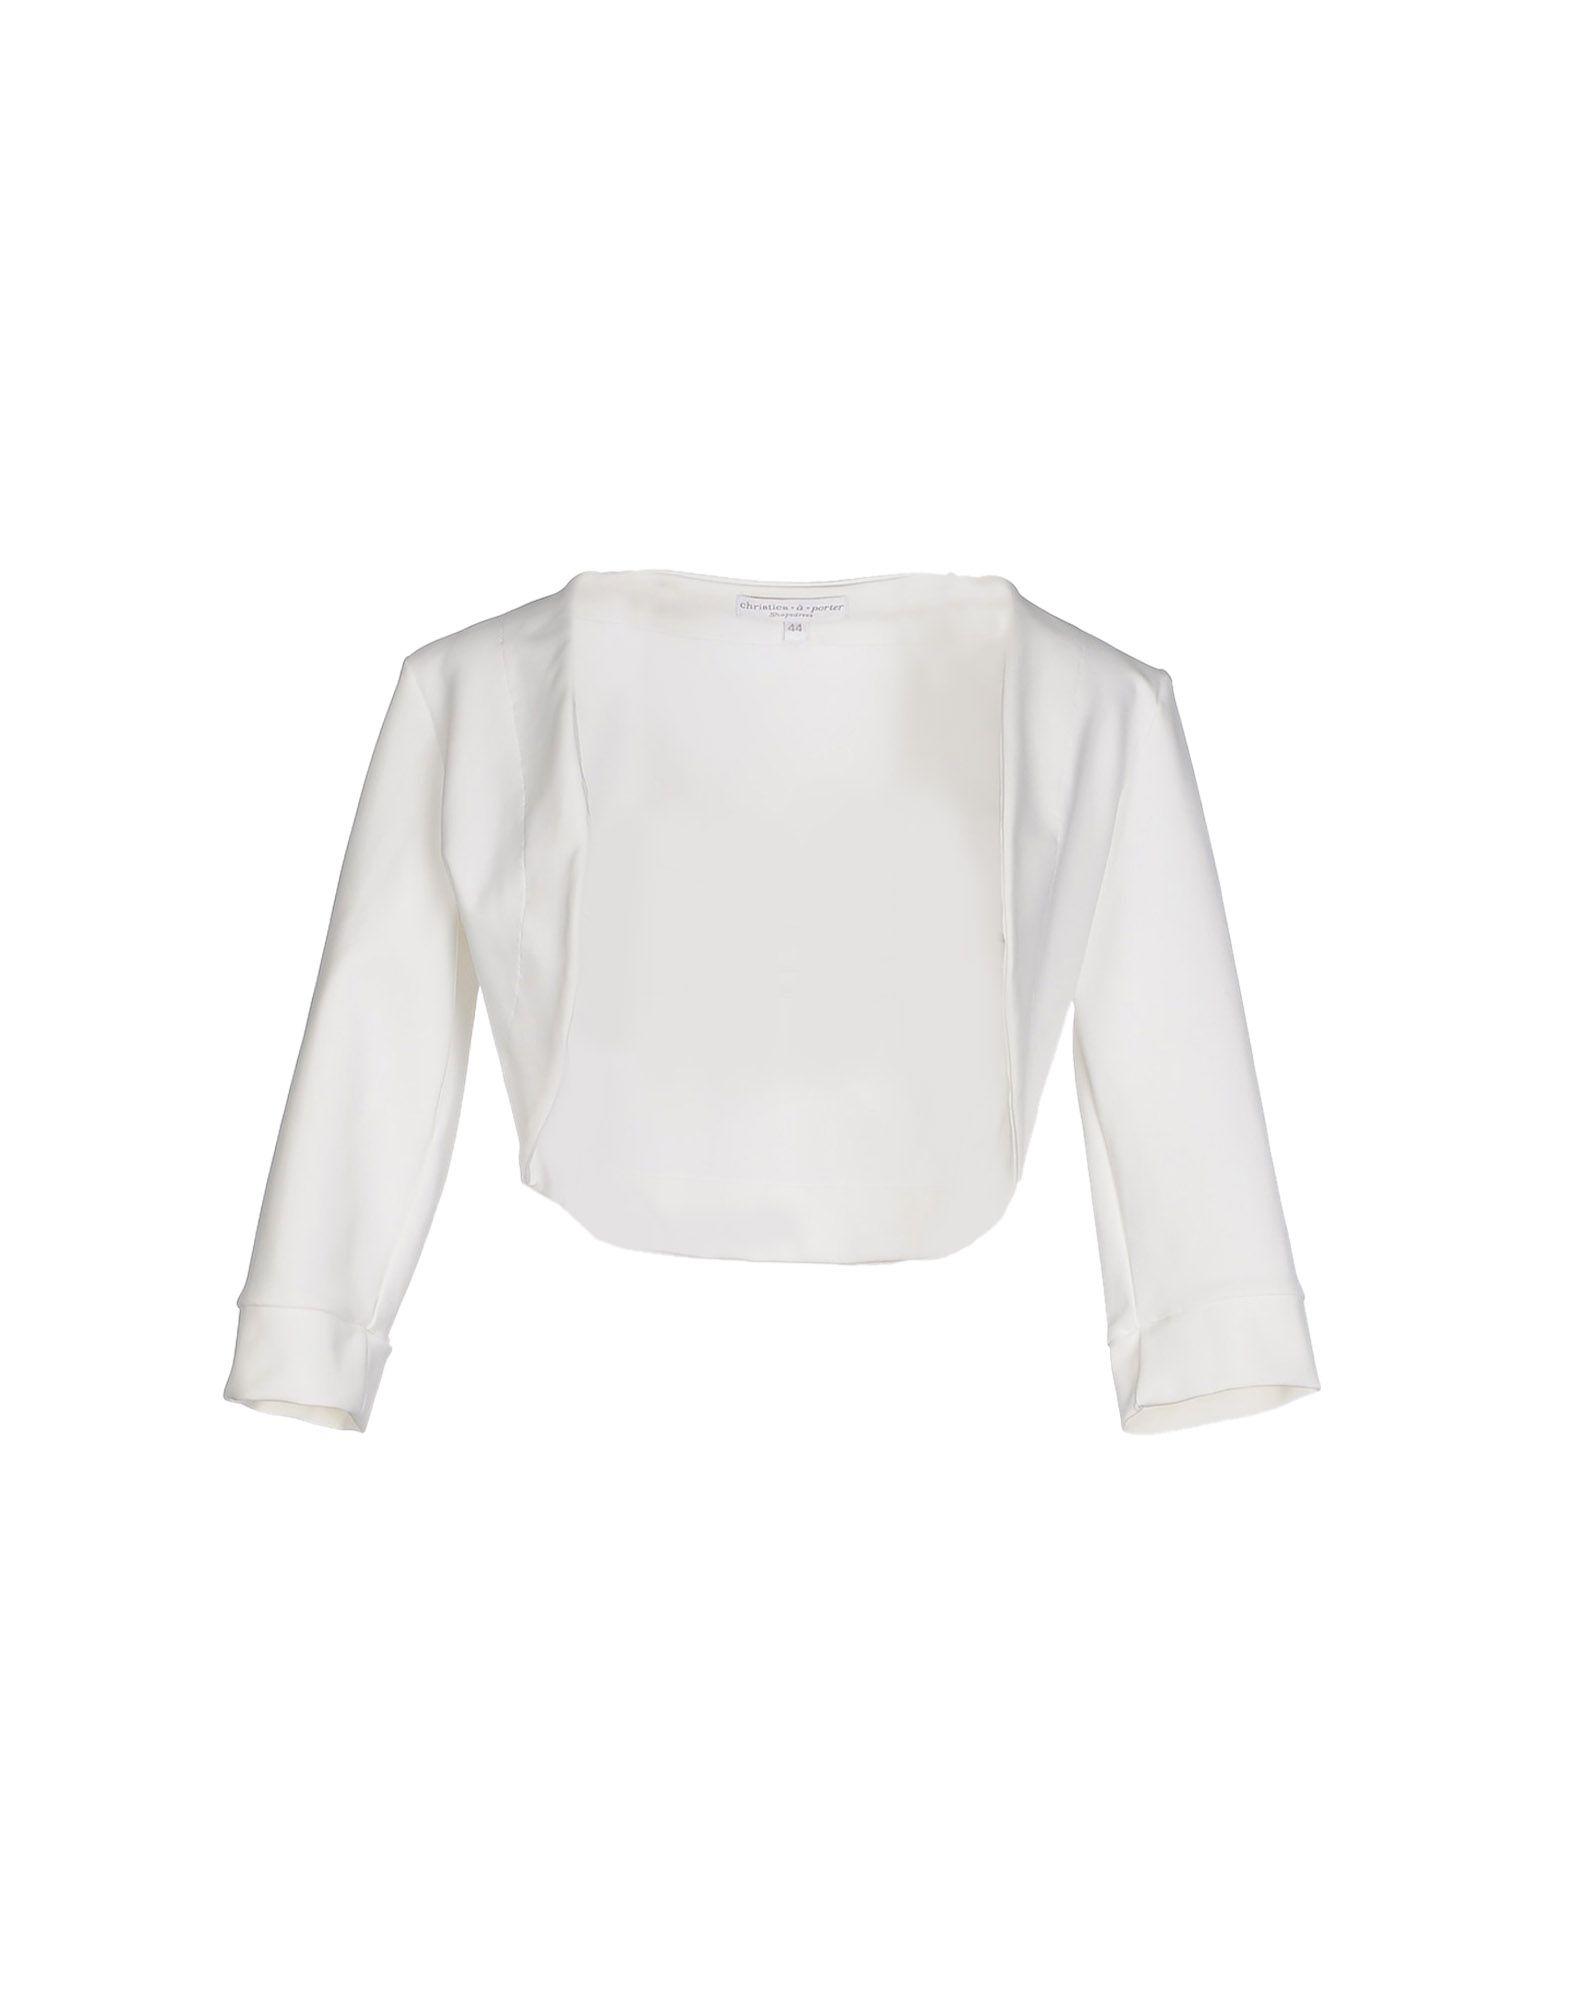 CHRISTIES À PORTER Пиджак maxima prét à porter пиджак